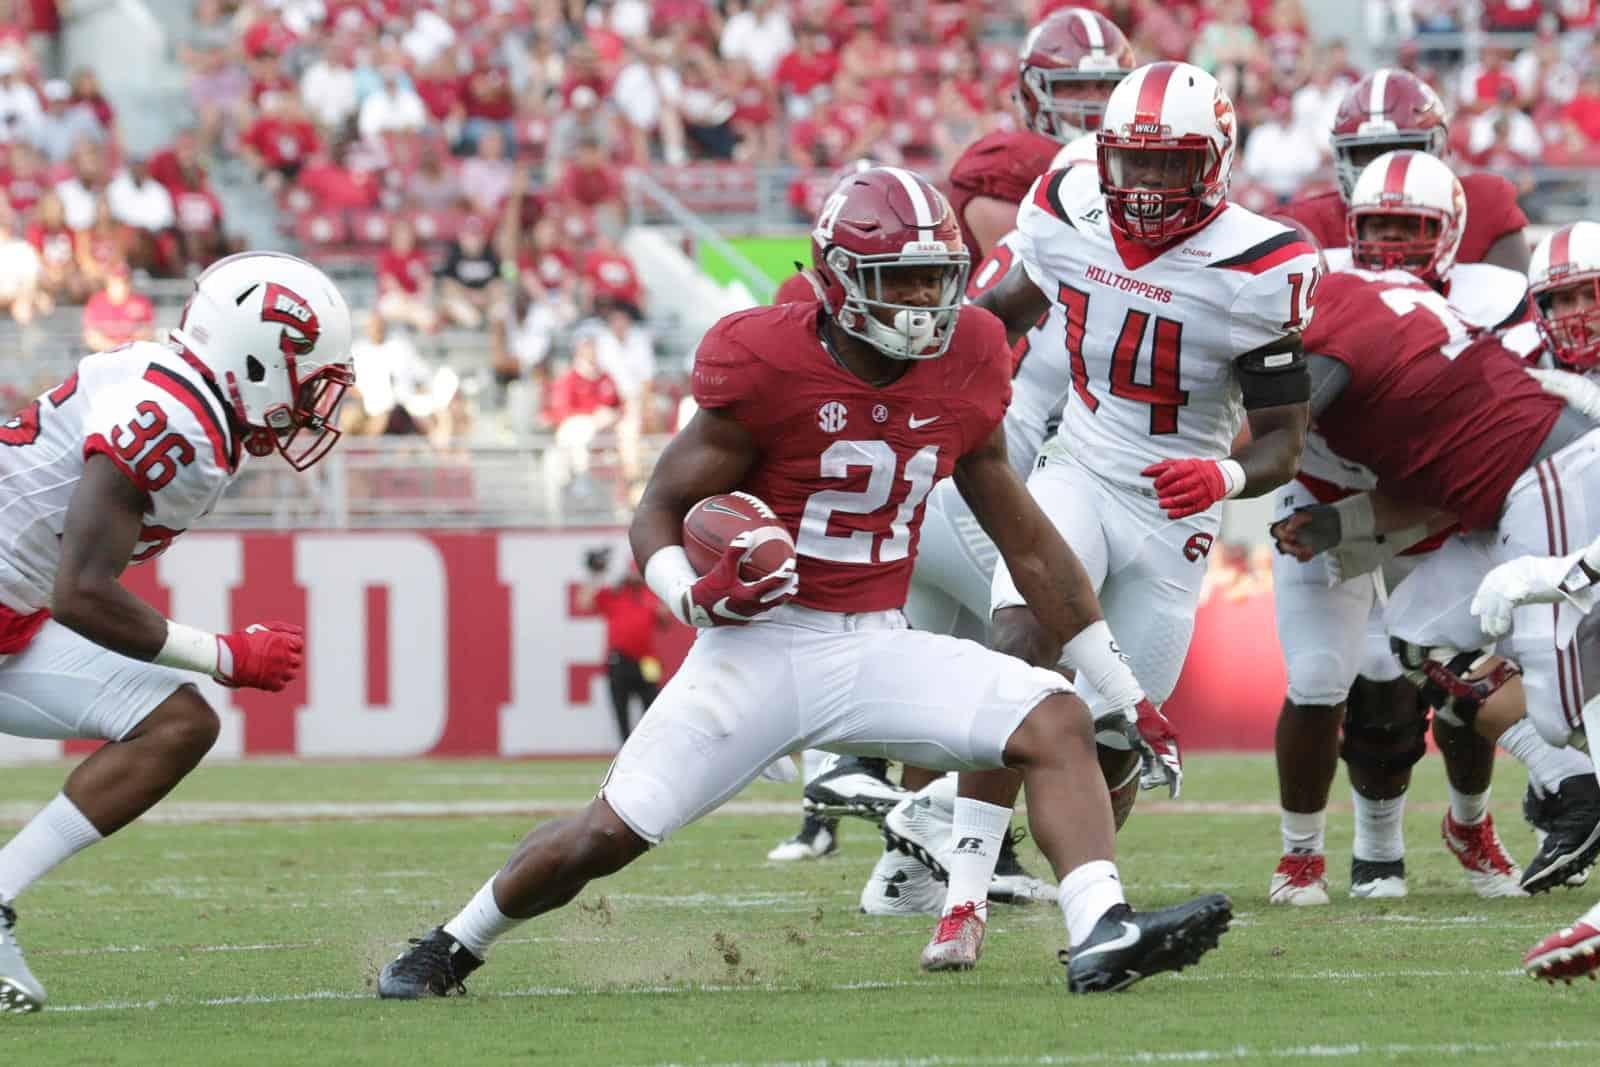 WKU at Alabama football game pushed back one season to 2024